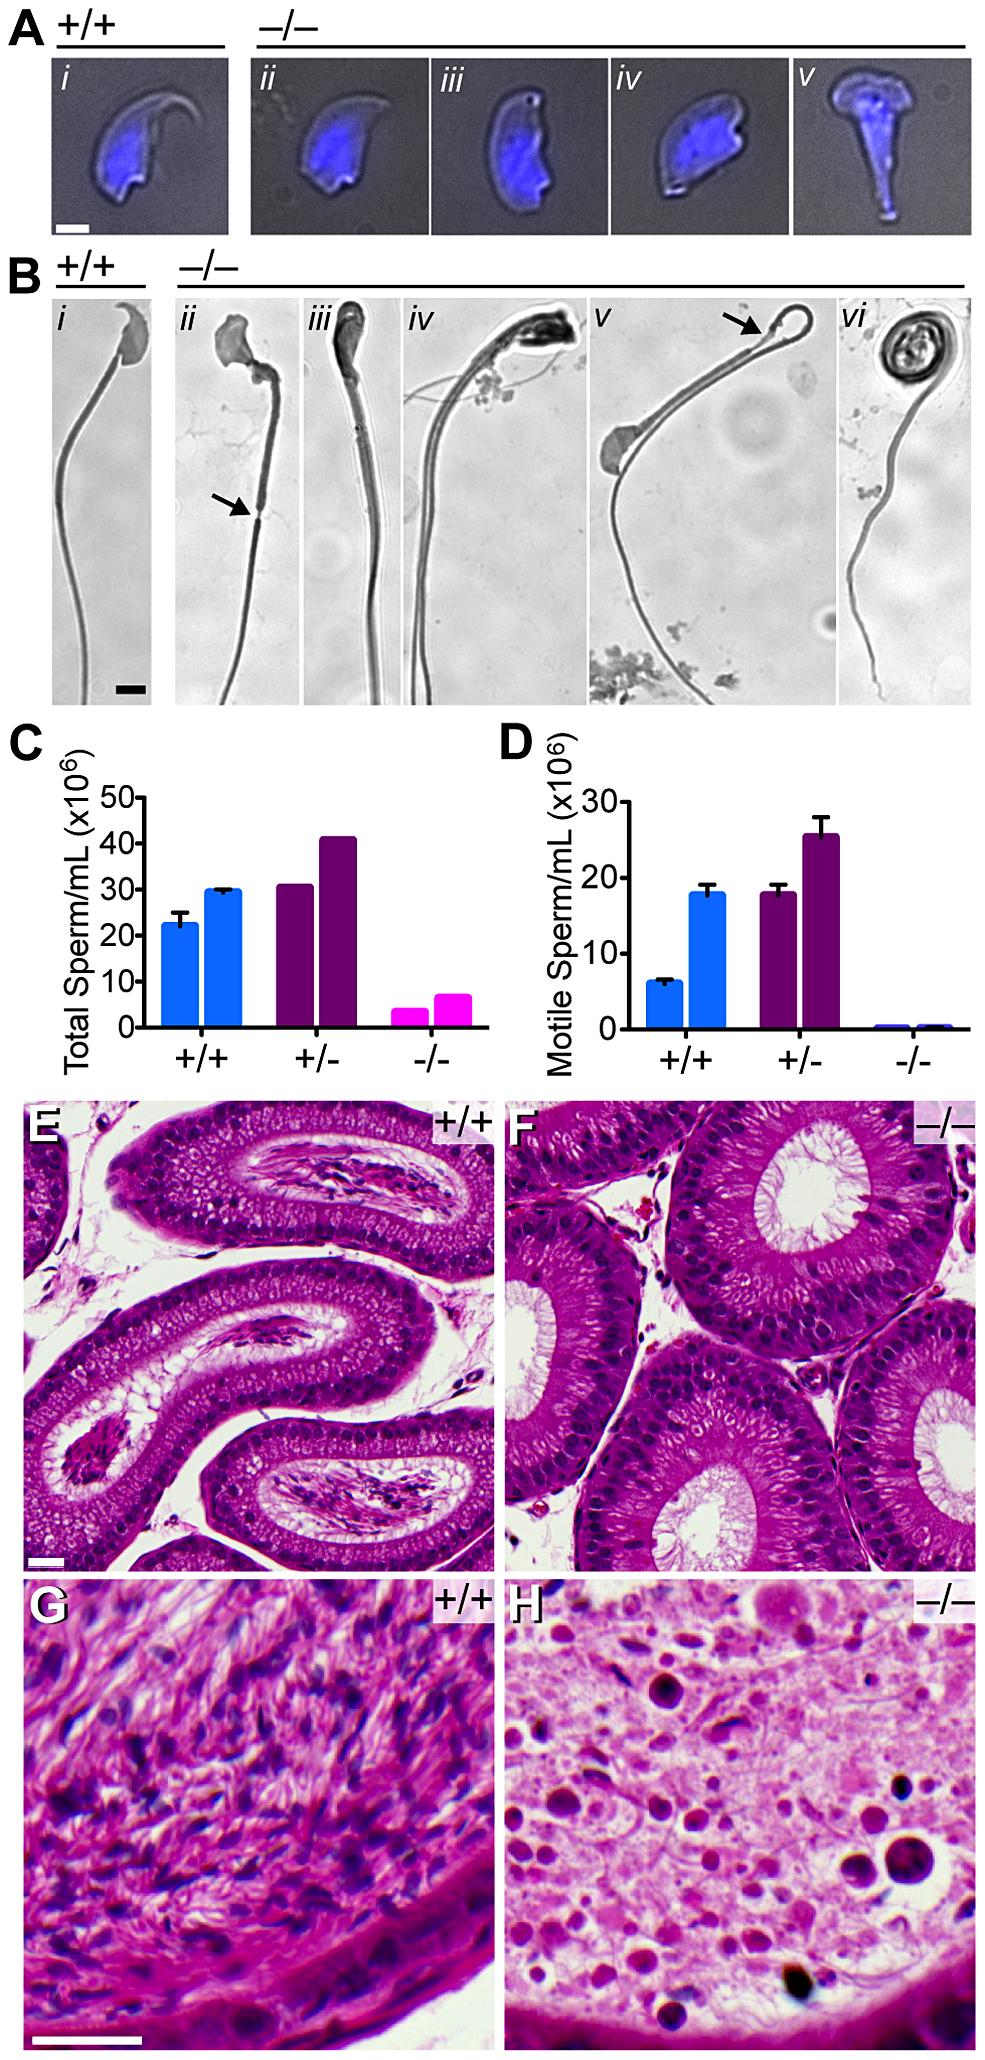 Quantitative and morphological defects of <i>Baz1a<sup>−/−</sup></i> sperm.